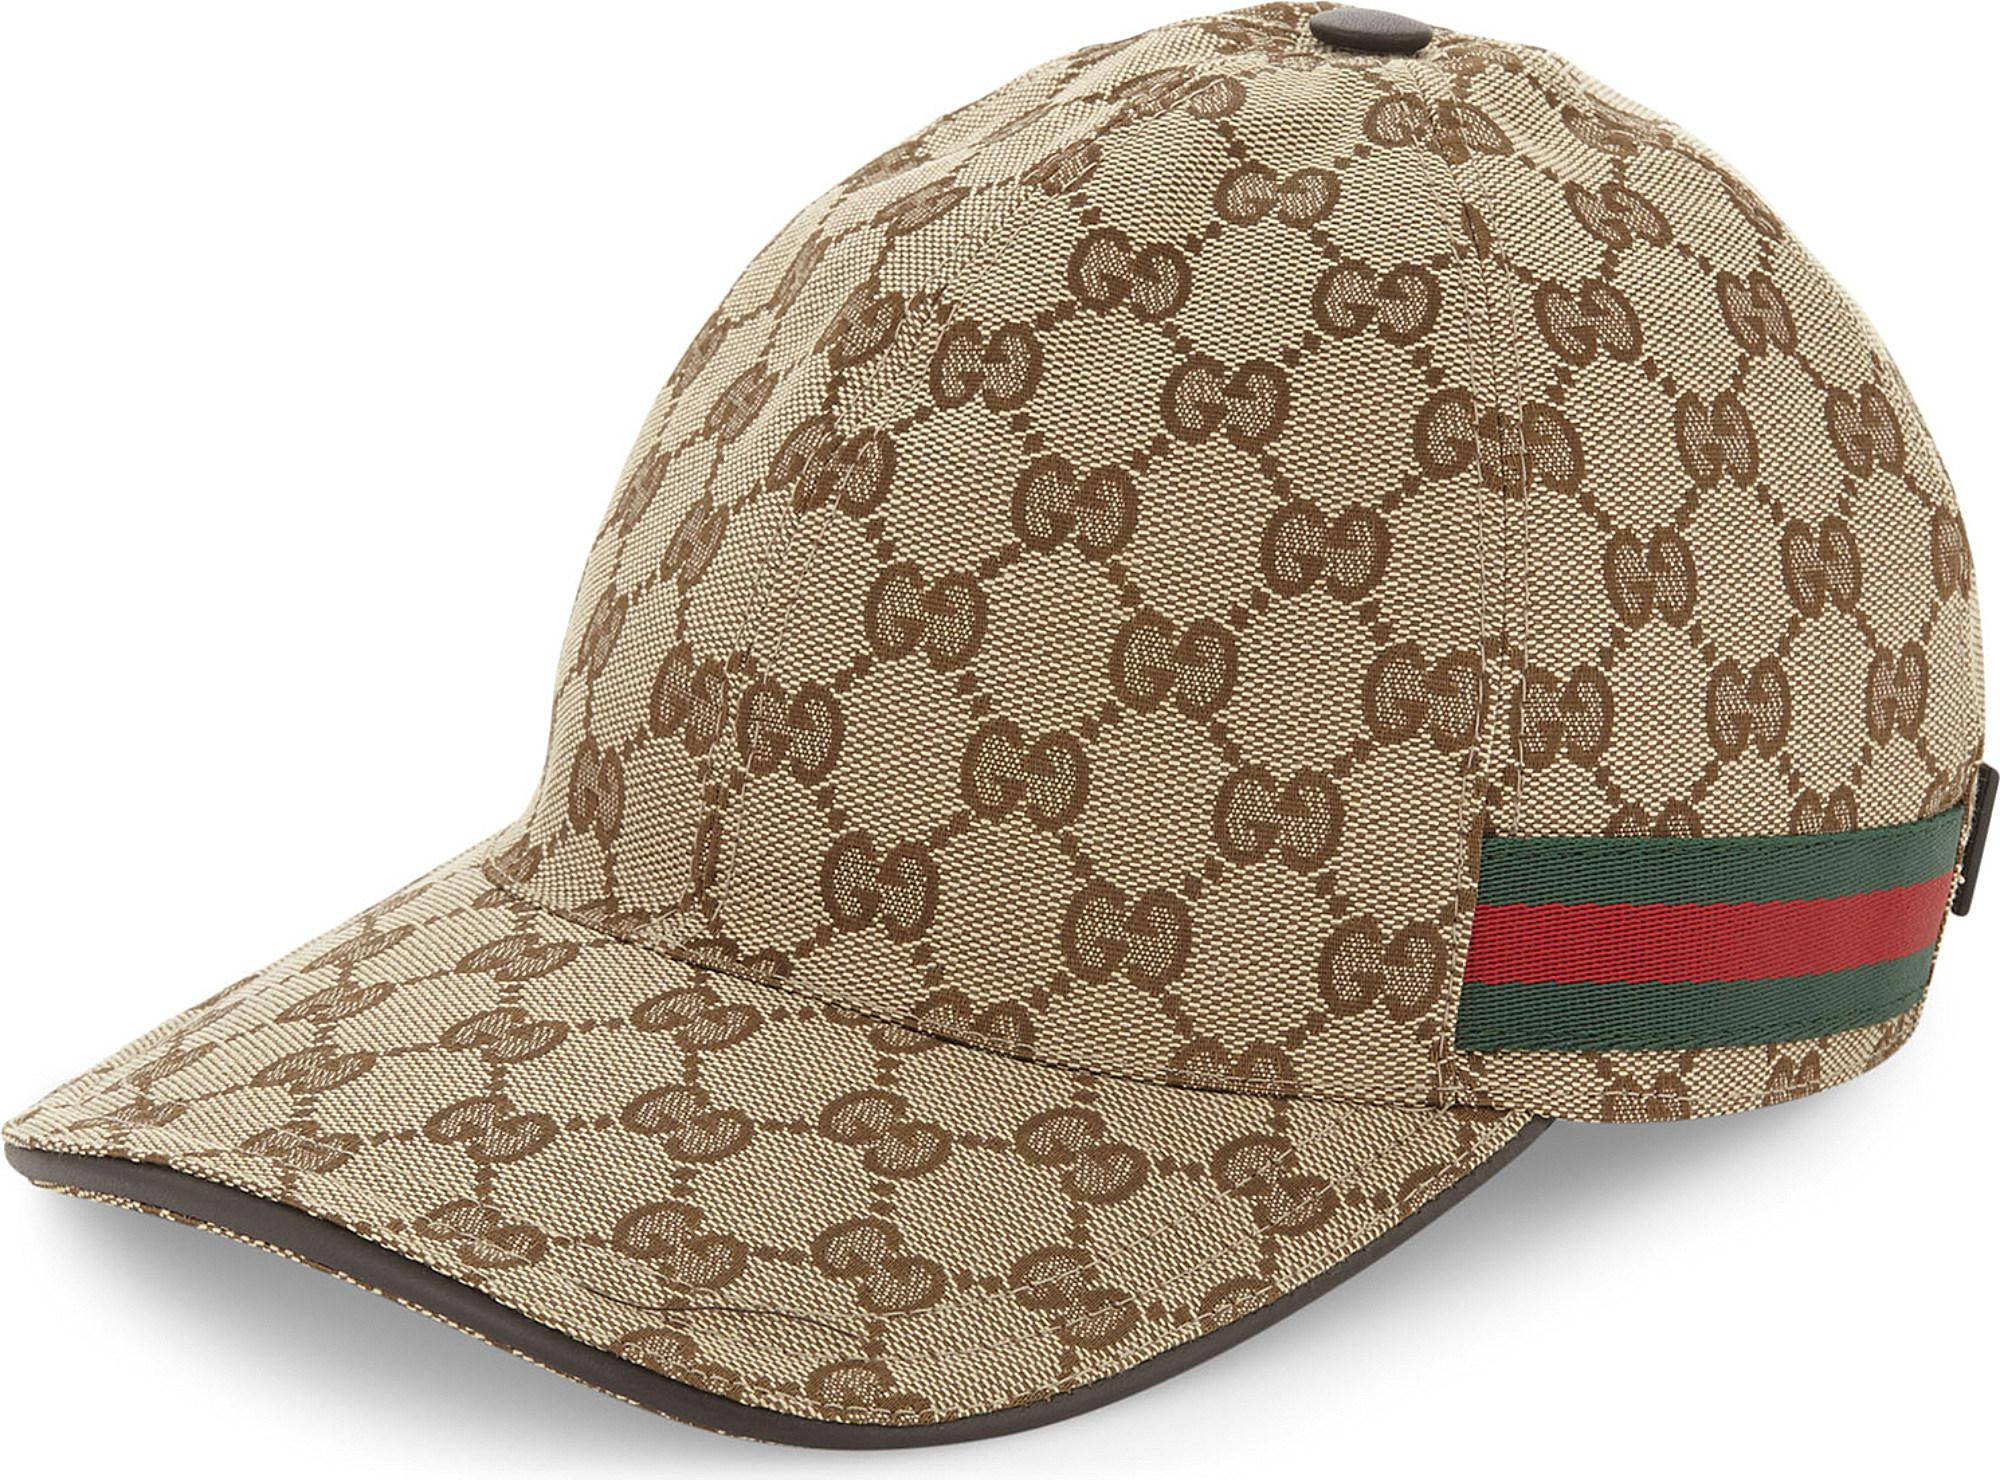 b1962588e97 Gucci GG Web Stripe Baseball Cap in Brown for Men - Save 51% - Lyst